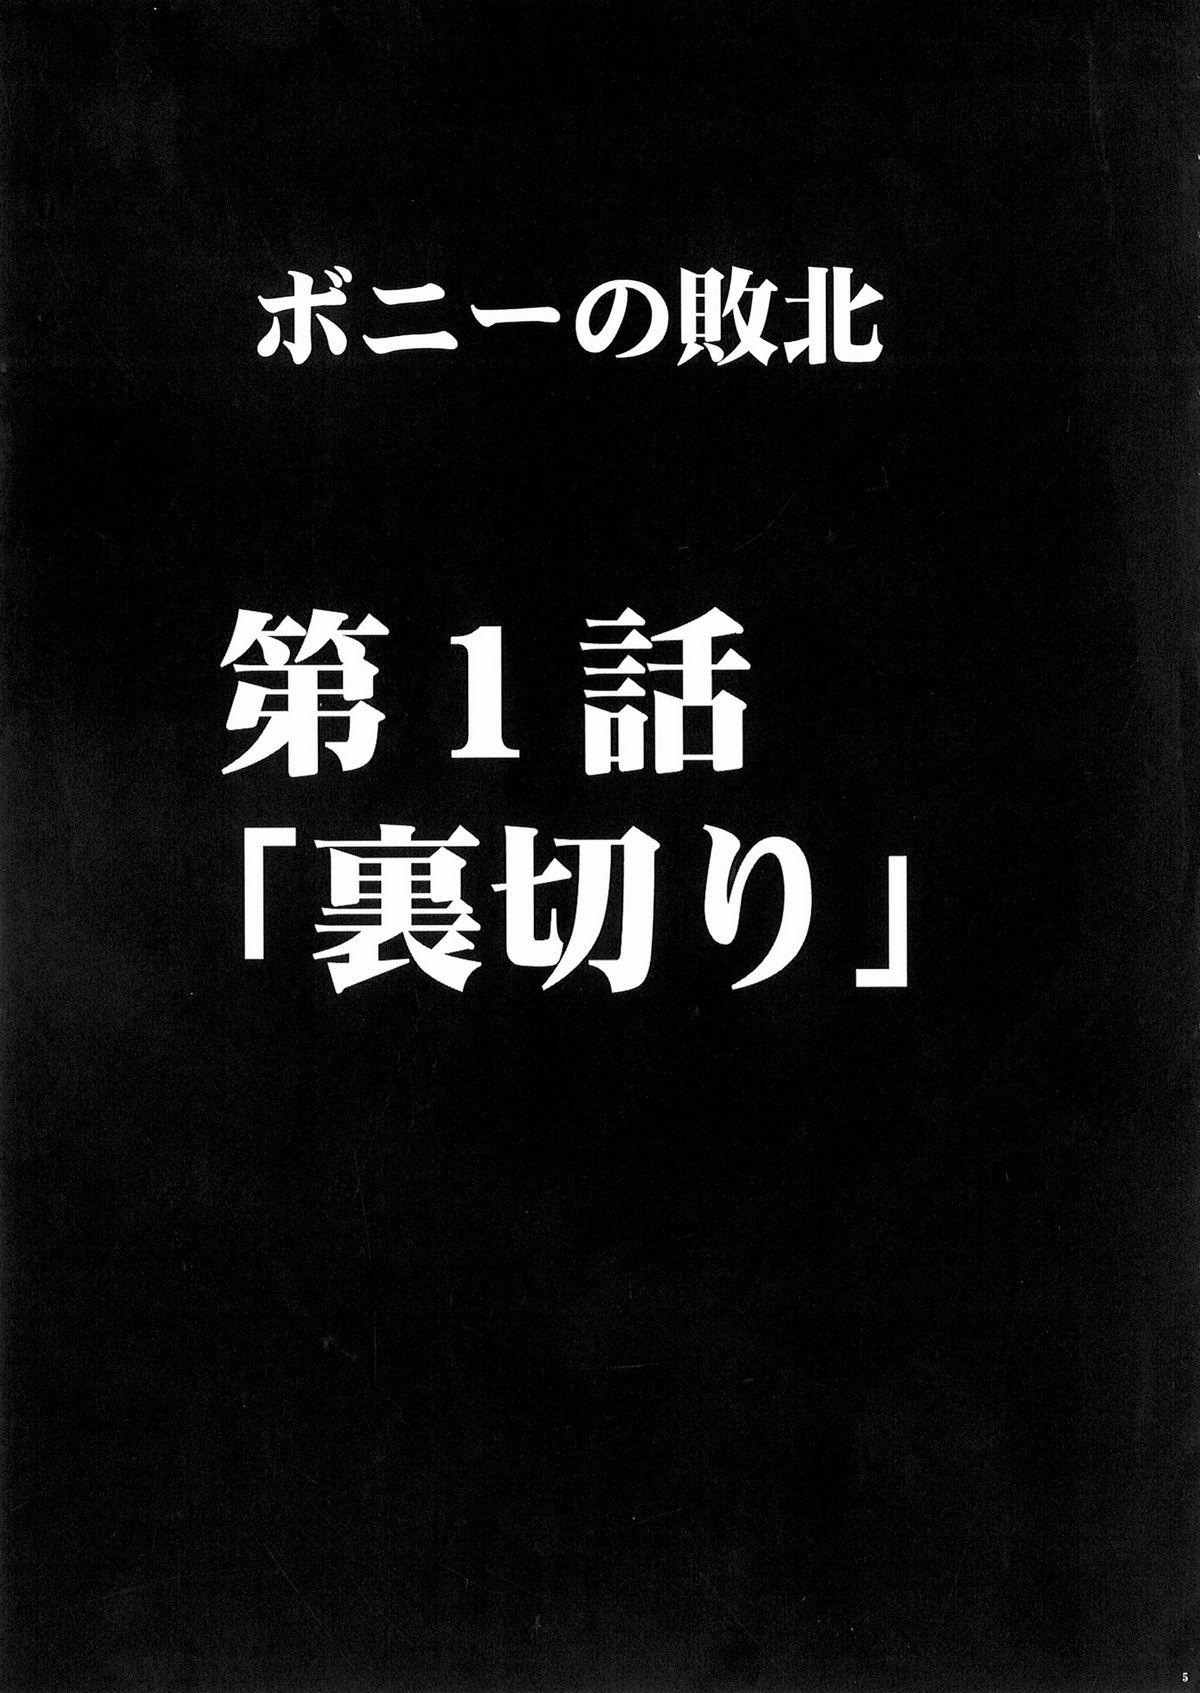 Bonnie no Haiboku 5